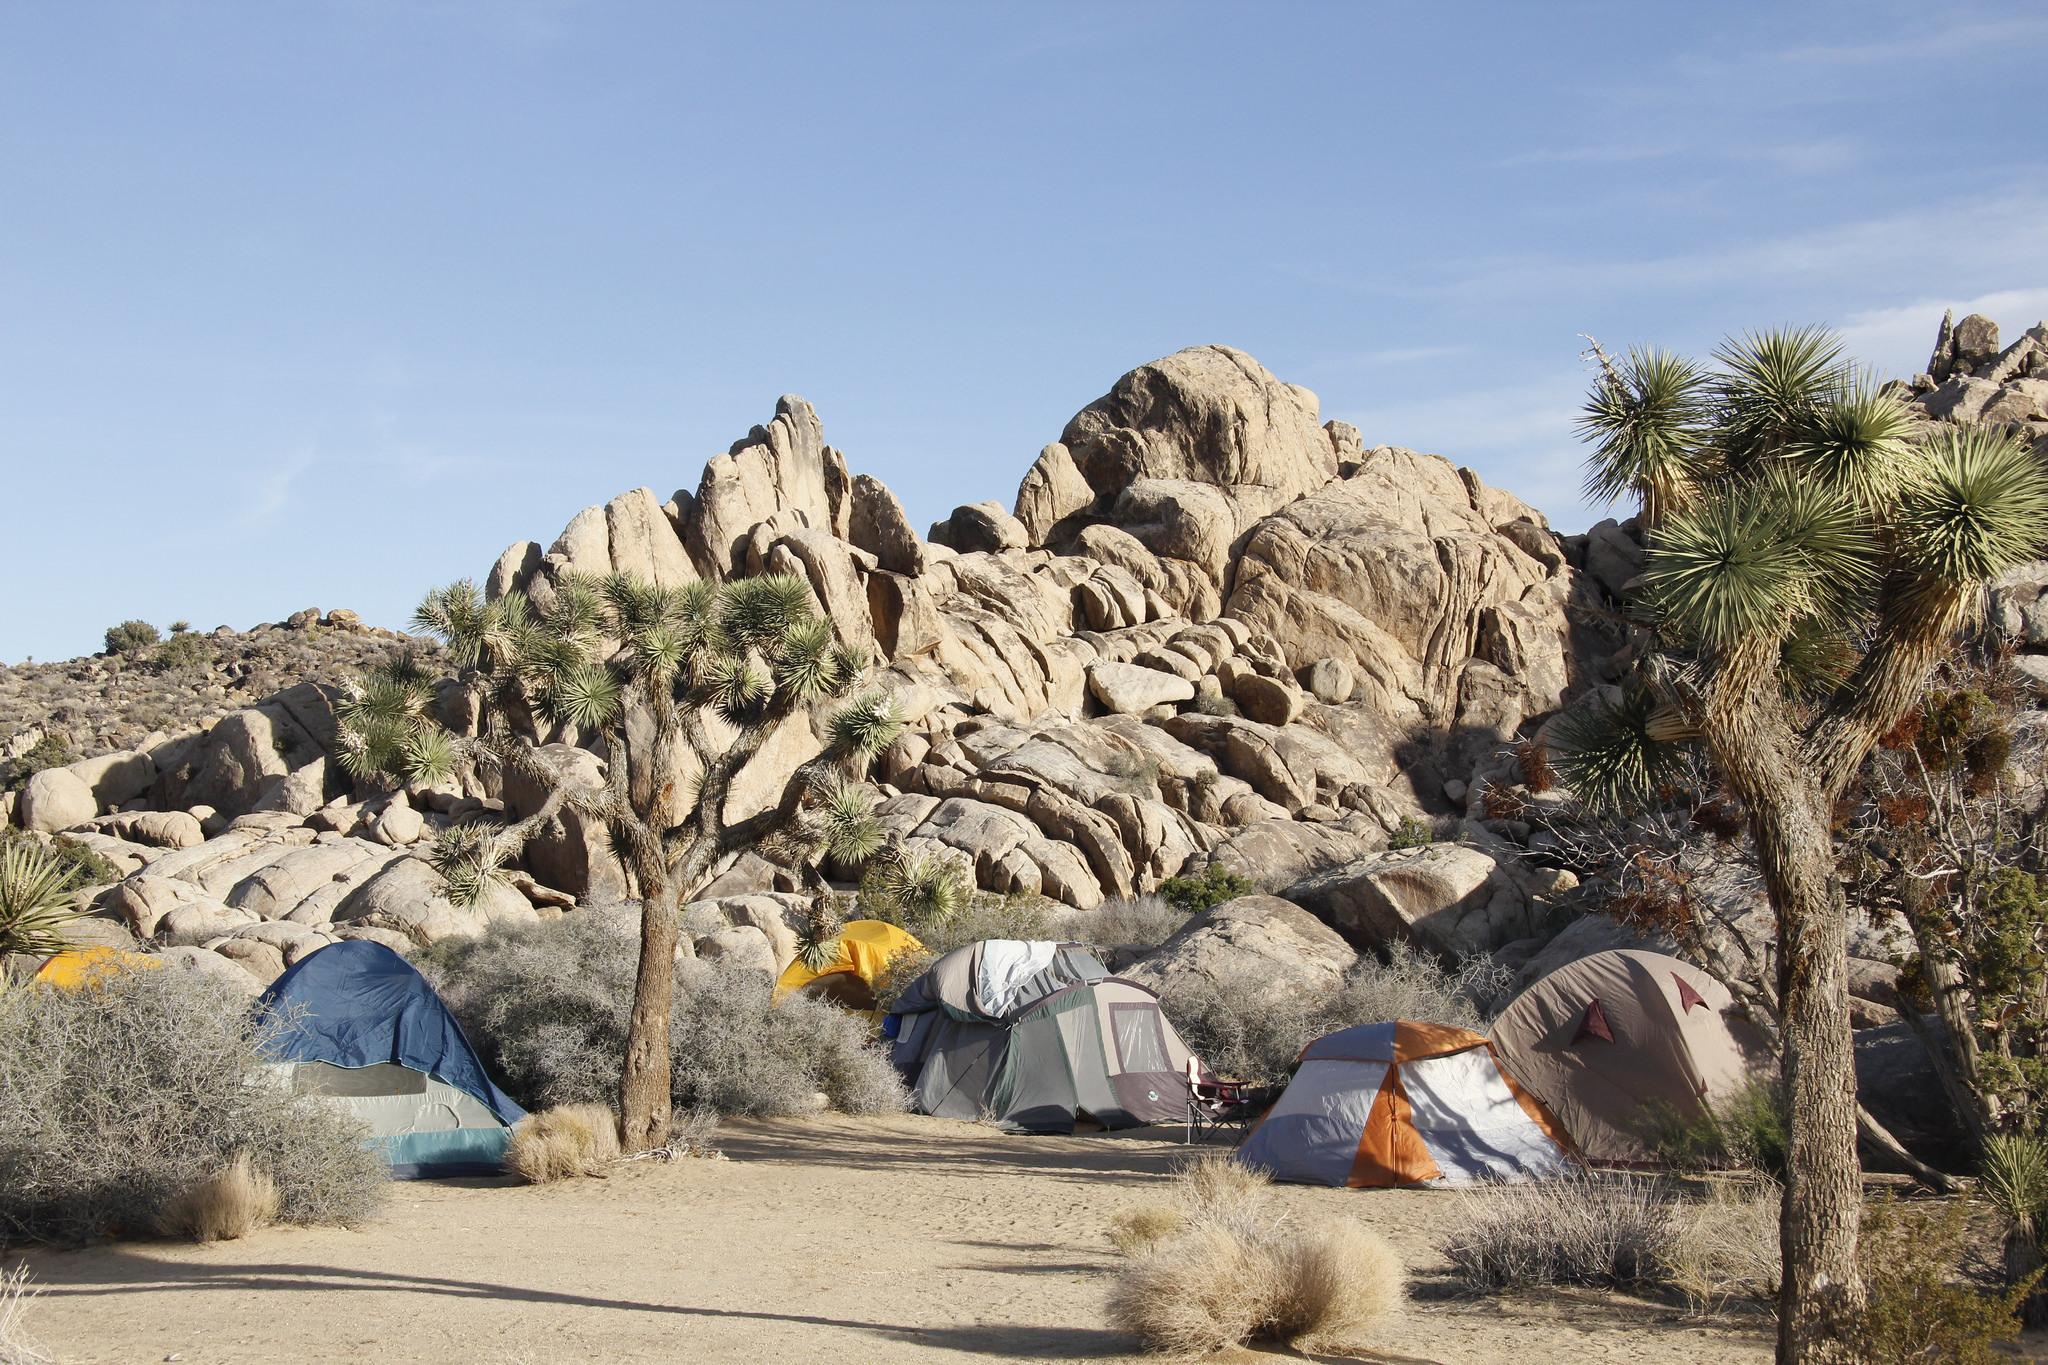 Joshua Tree Camping Guide For Desert Adventurers